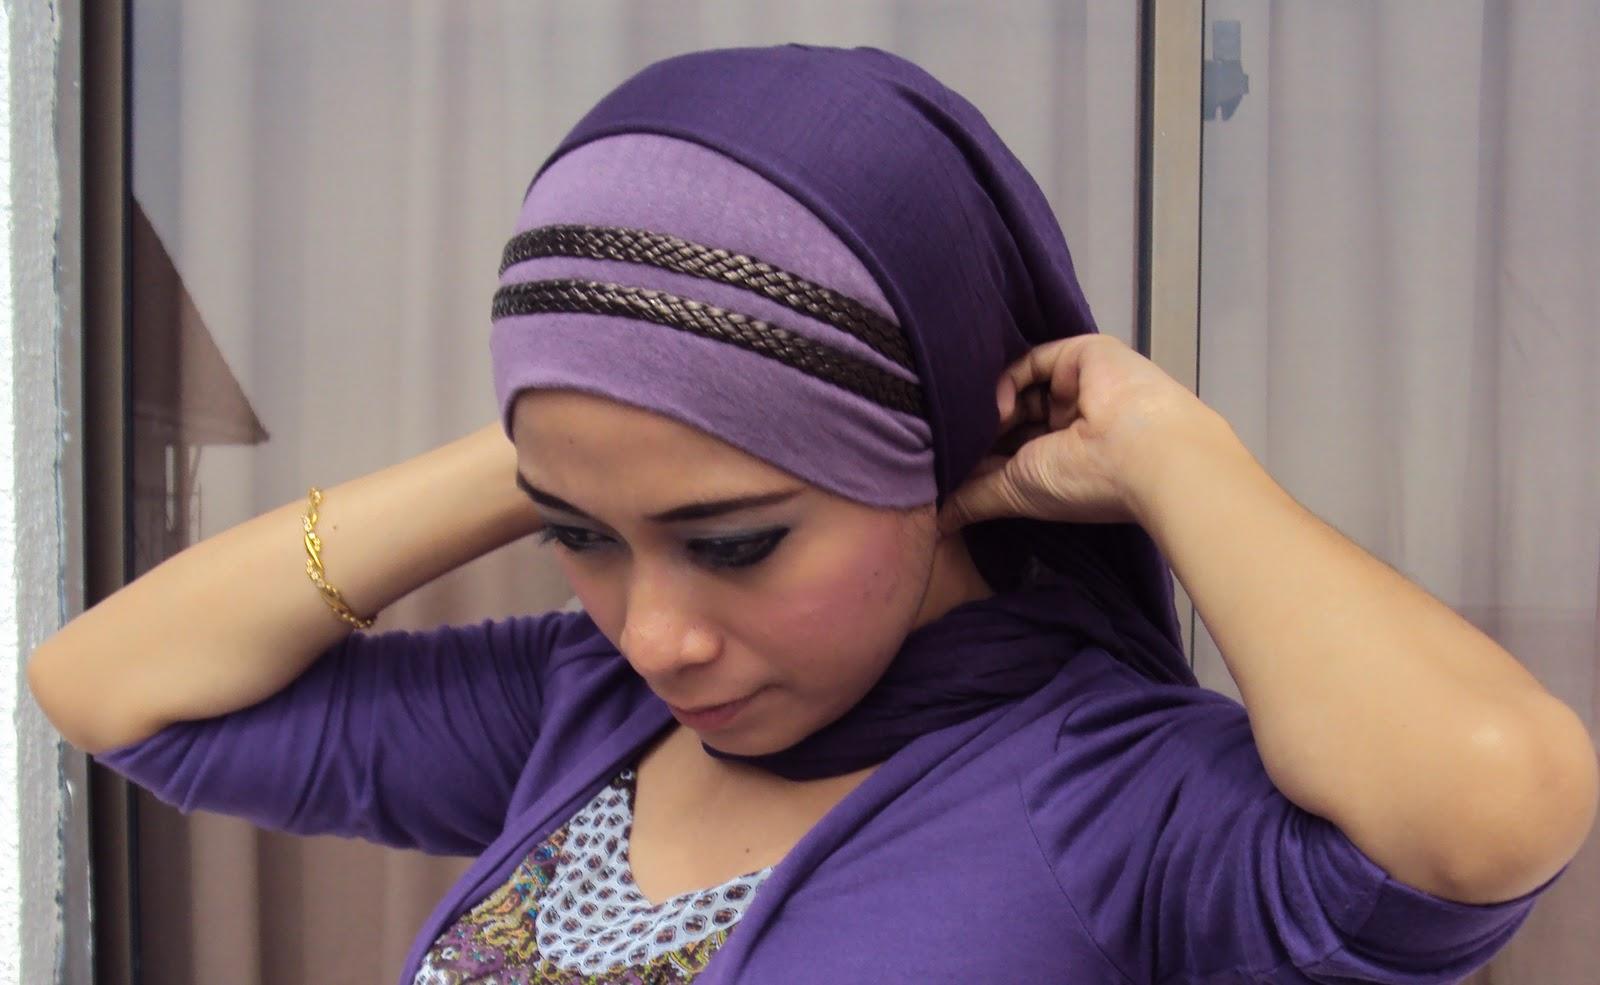 emma pakai inner light purple dihiasi headband 2 layer dark brown.